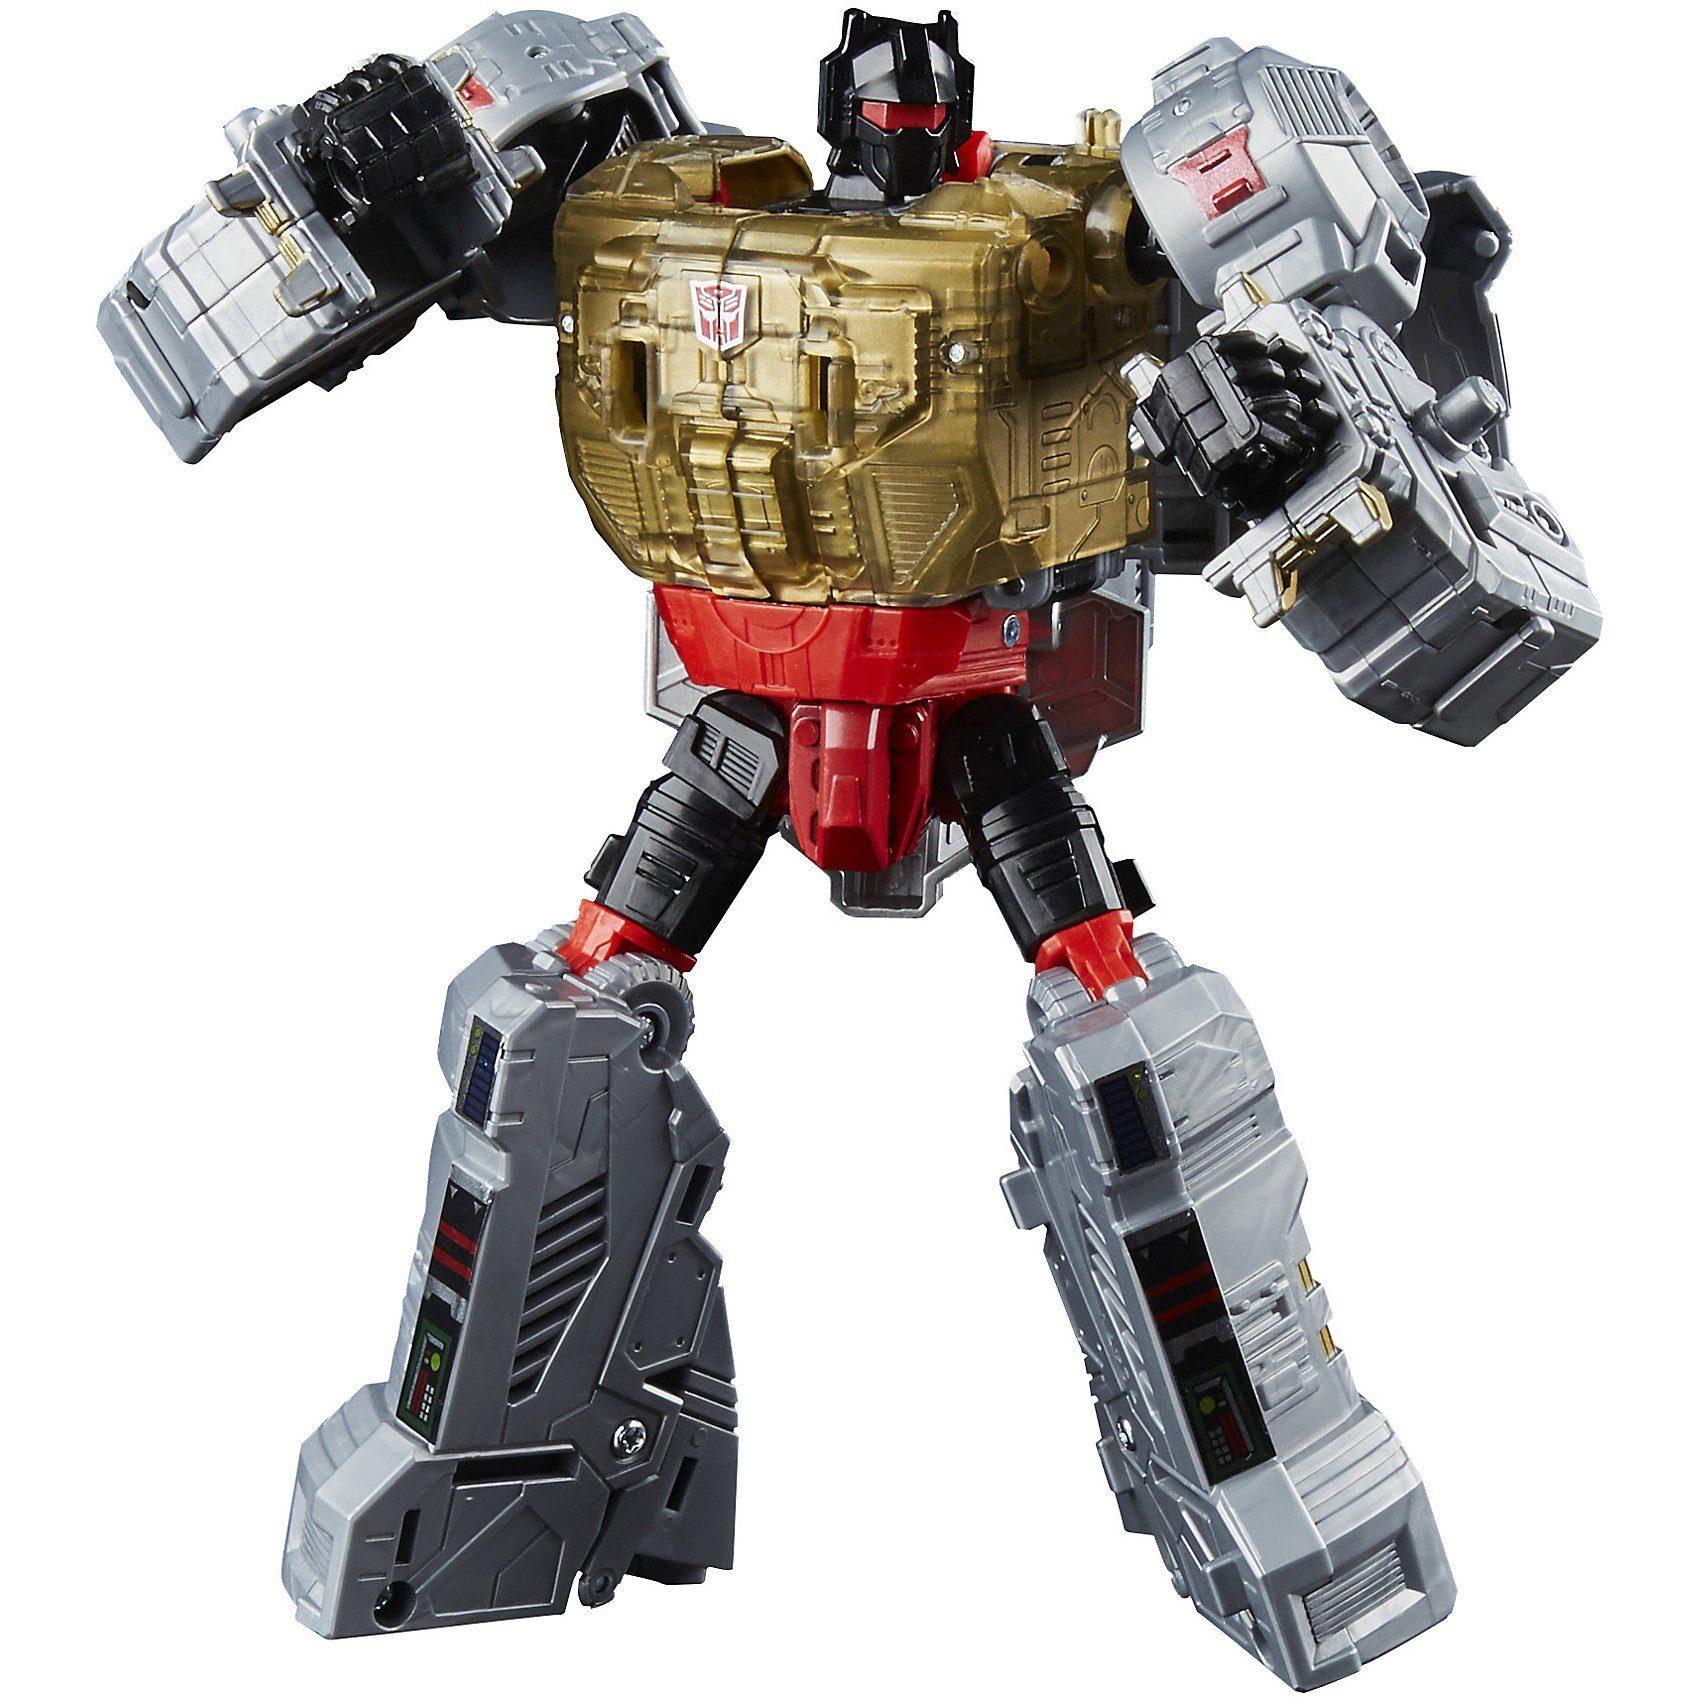 Hasbro Transformers GEN Power of the Primes Grimlock